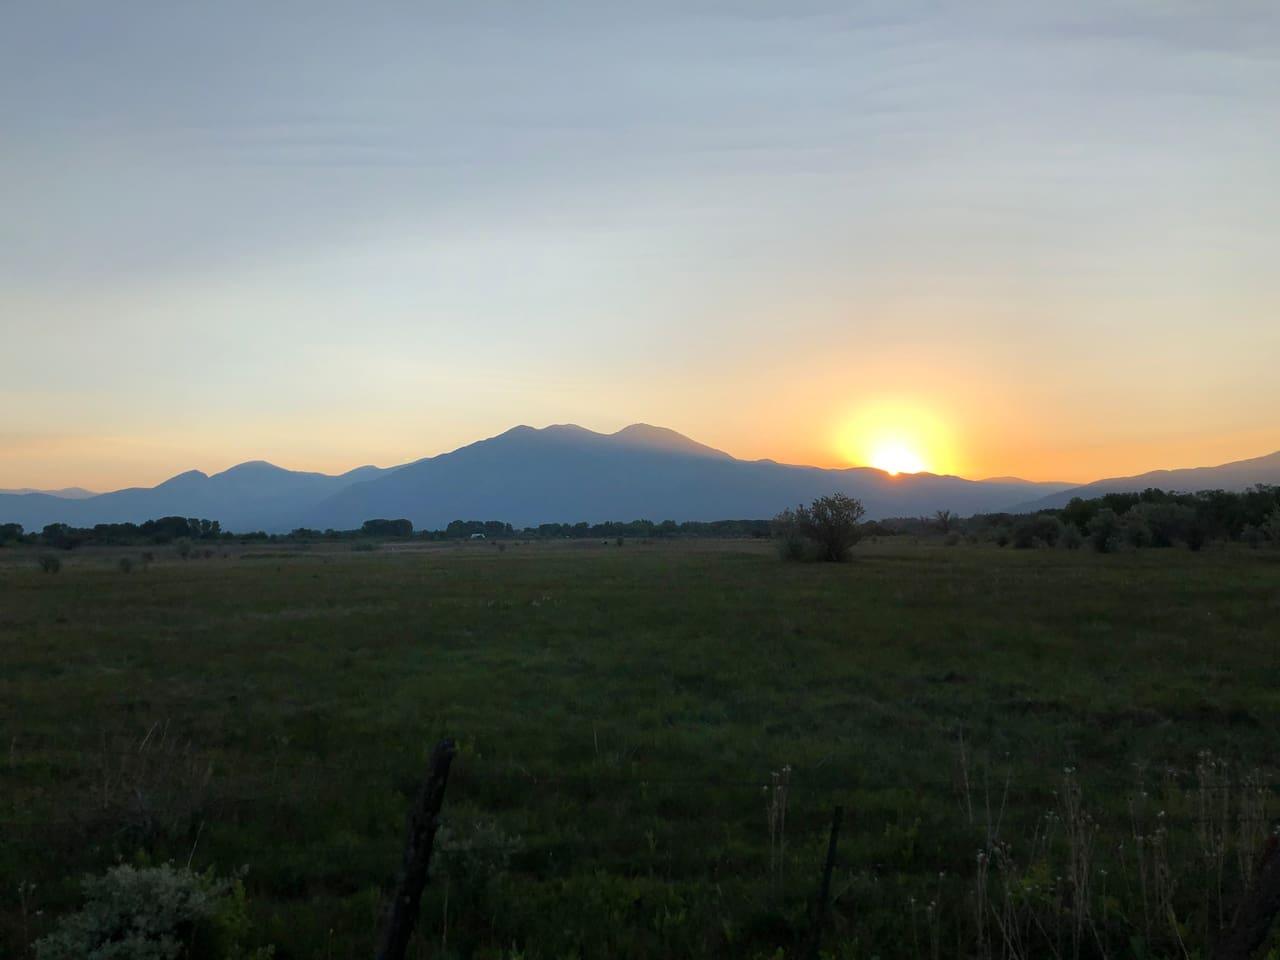 Taos Mountain Sunrise from Hacienda Rio Pueblo - Begin Again